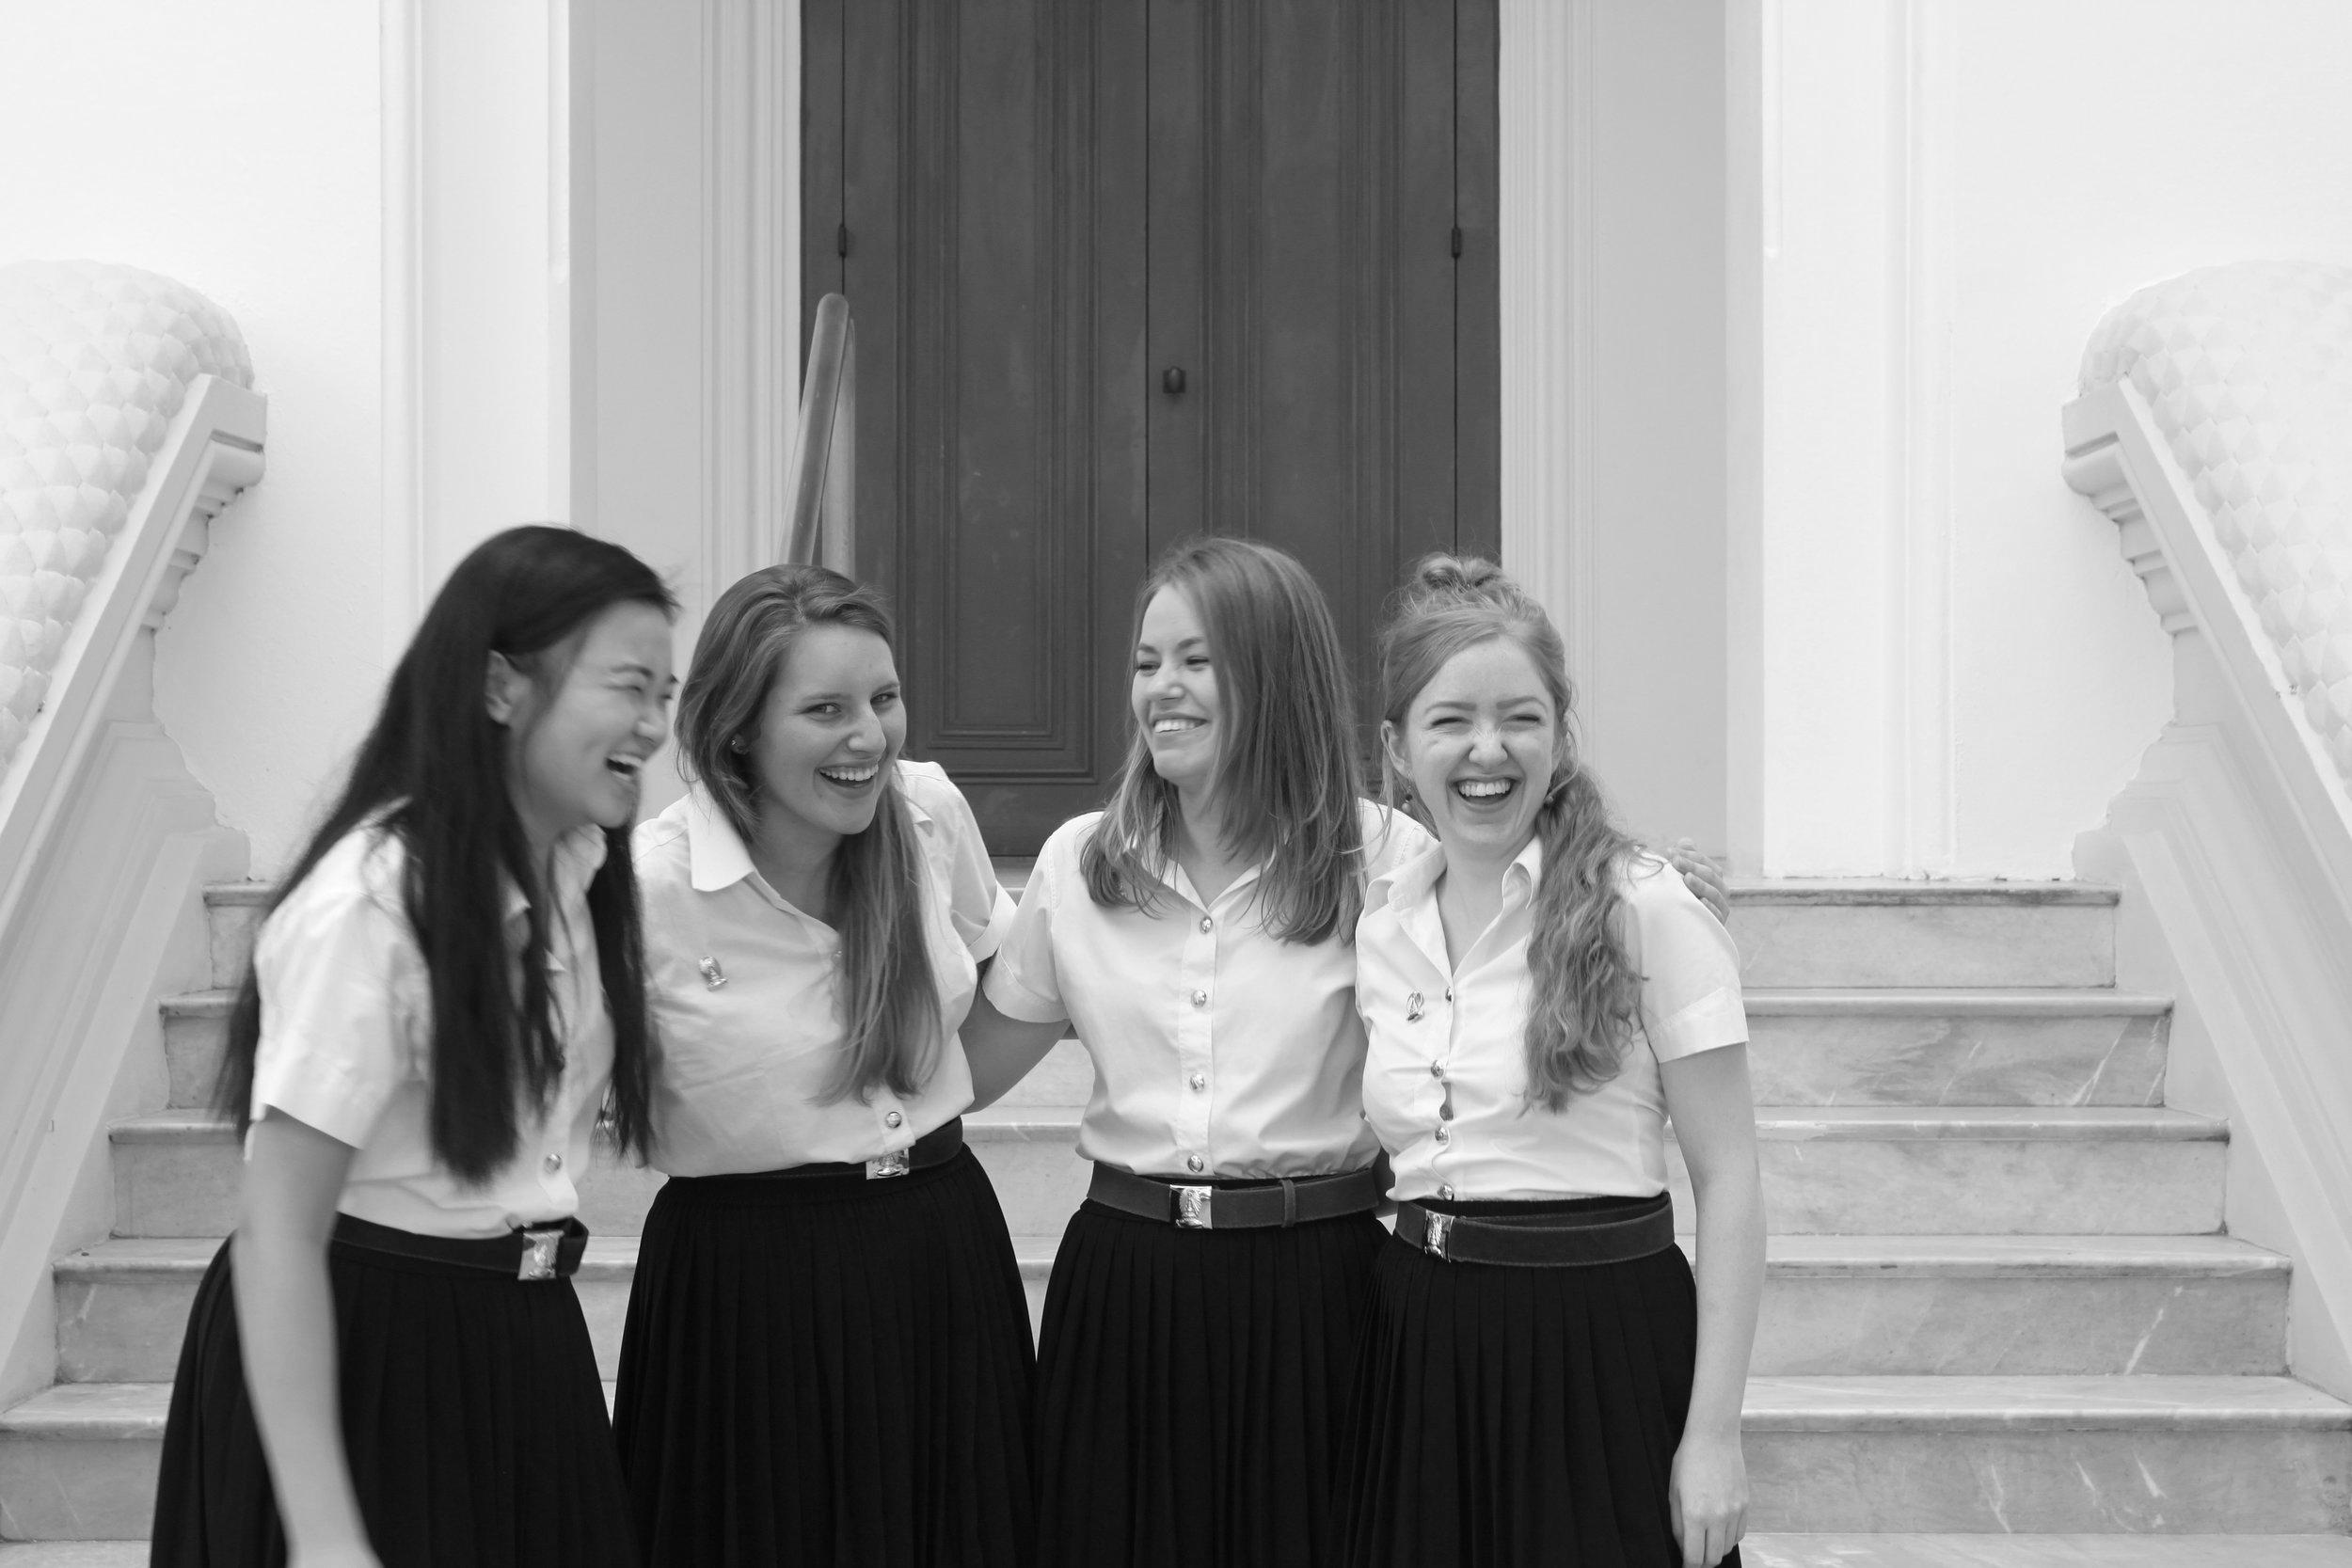 521: Me, Erika, Ebony, Charlotte, Chulalongkorn University